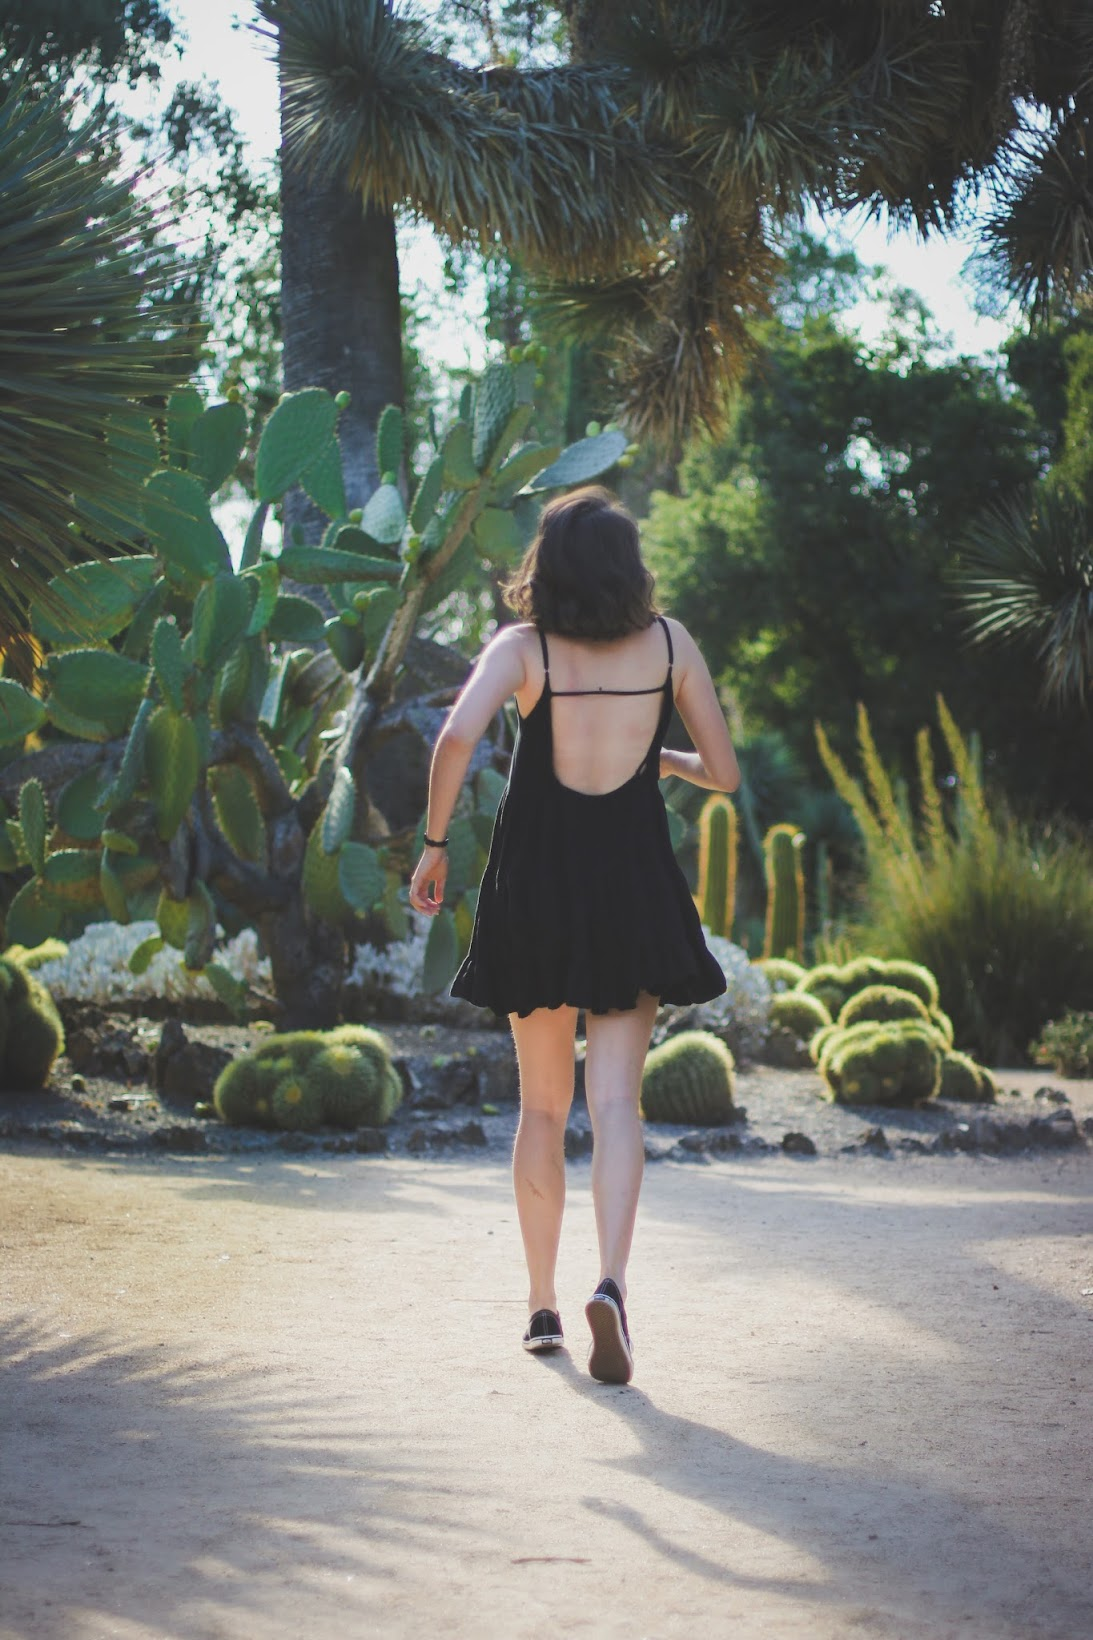 Black Brandy Melville Jada dress in a cactus garden.